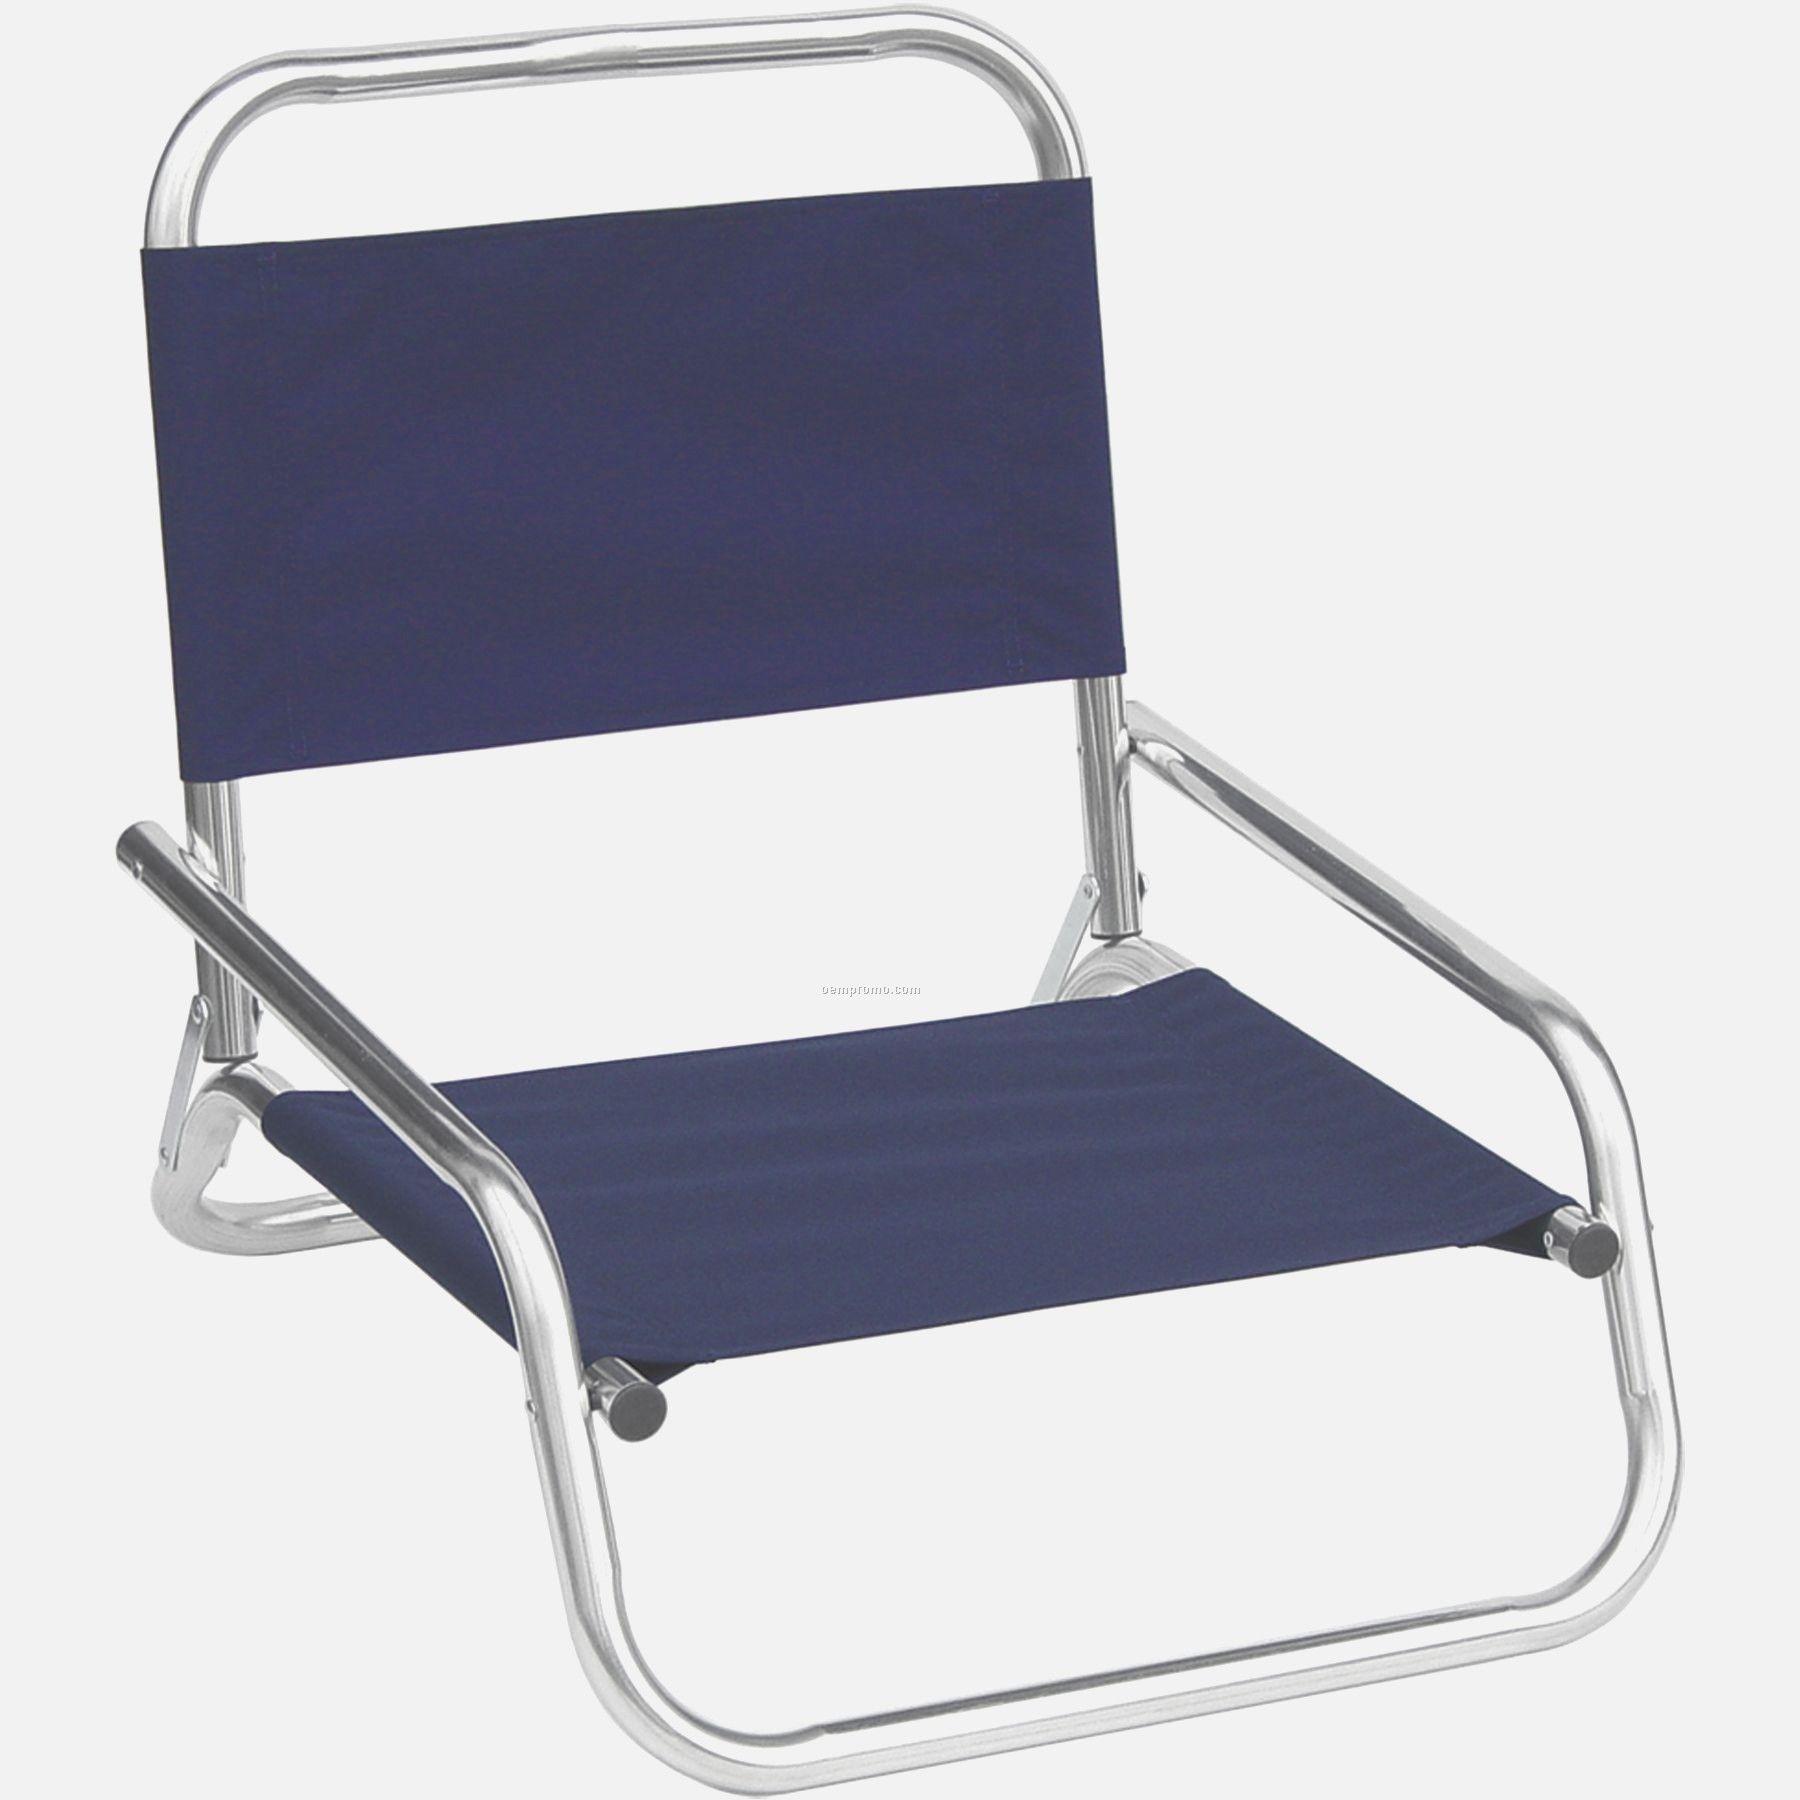 Low Back Beach Chairs Low beach chairs, Beach chairs